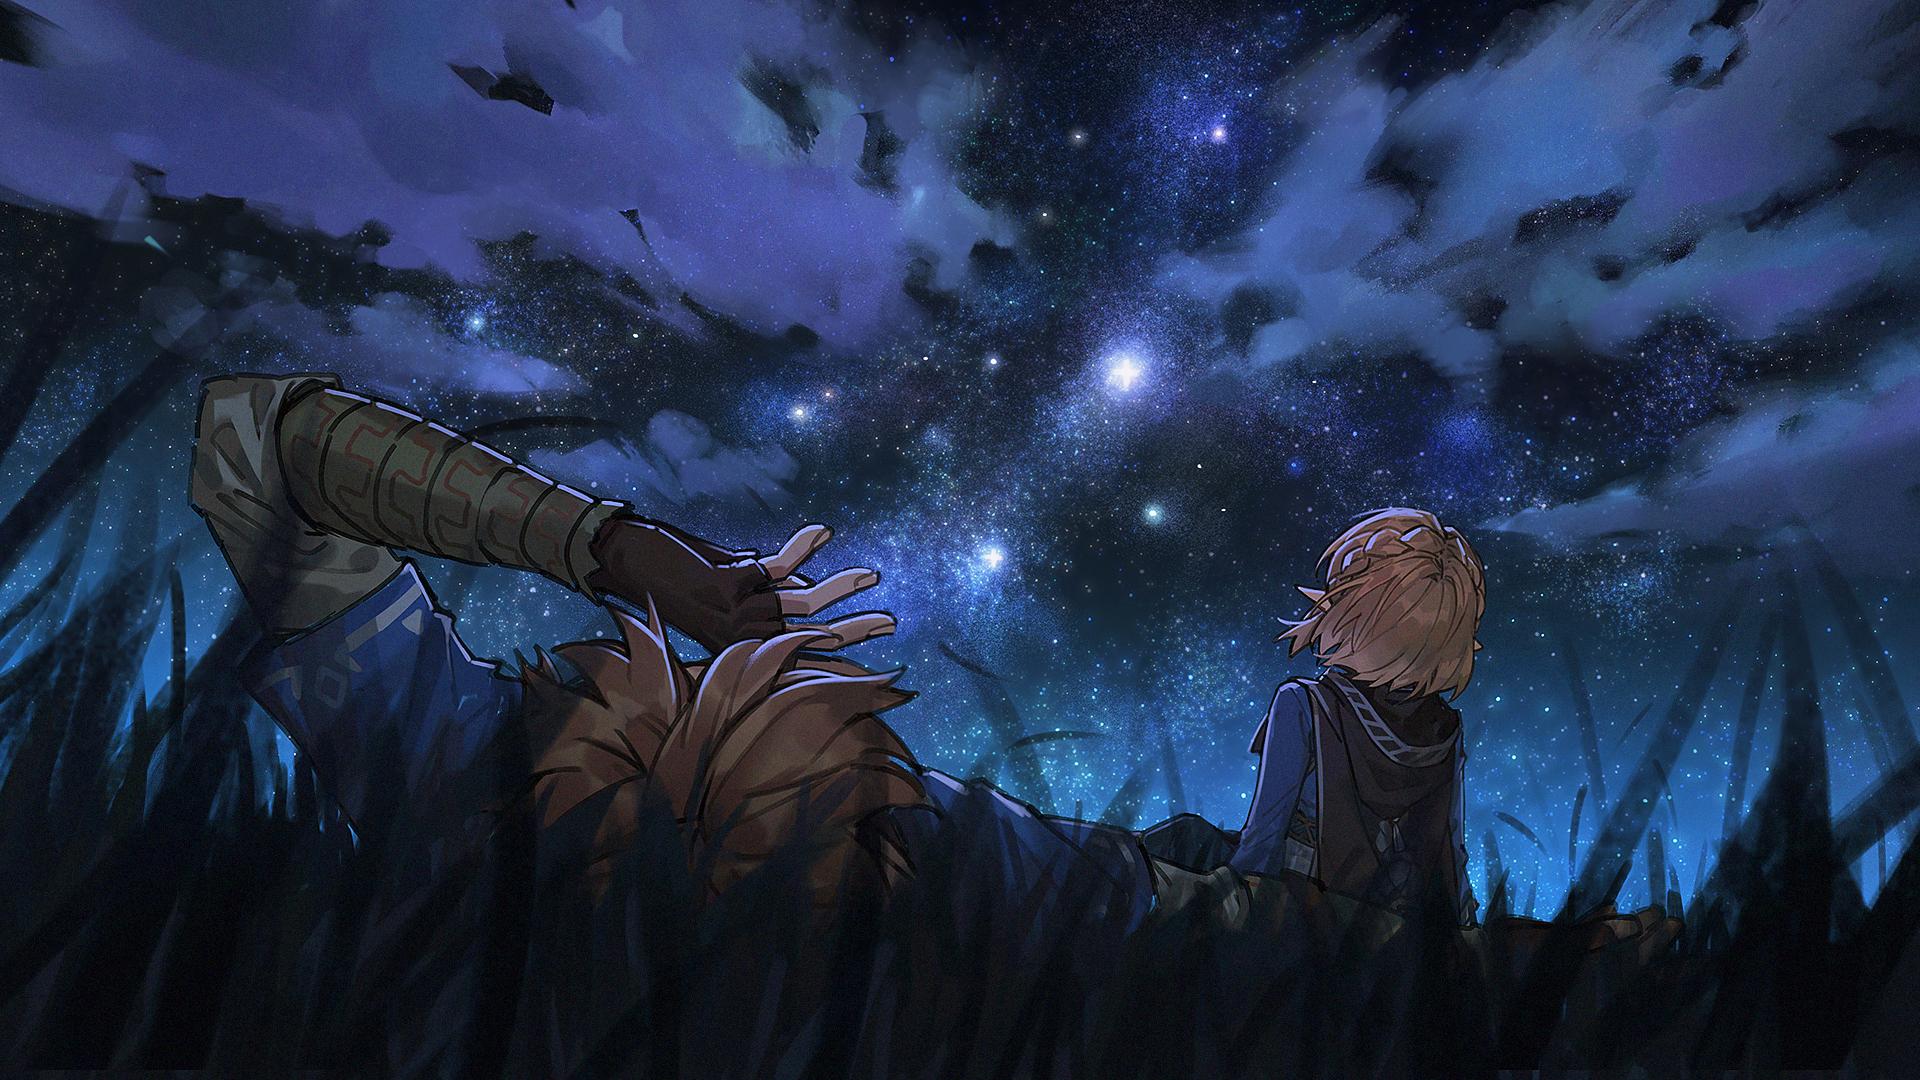 The Legend Of Zelda Breath Of The Wild Hd Wallpaper Background